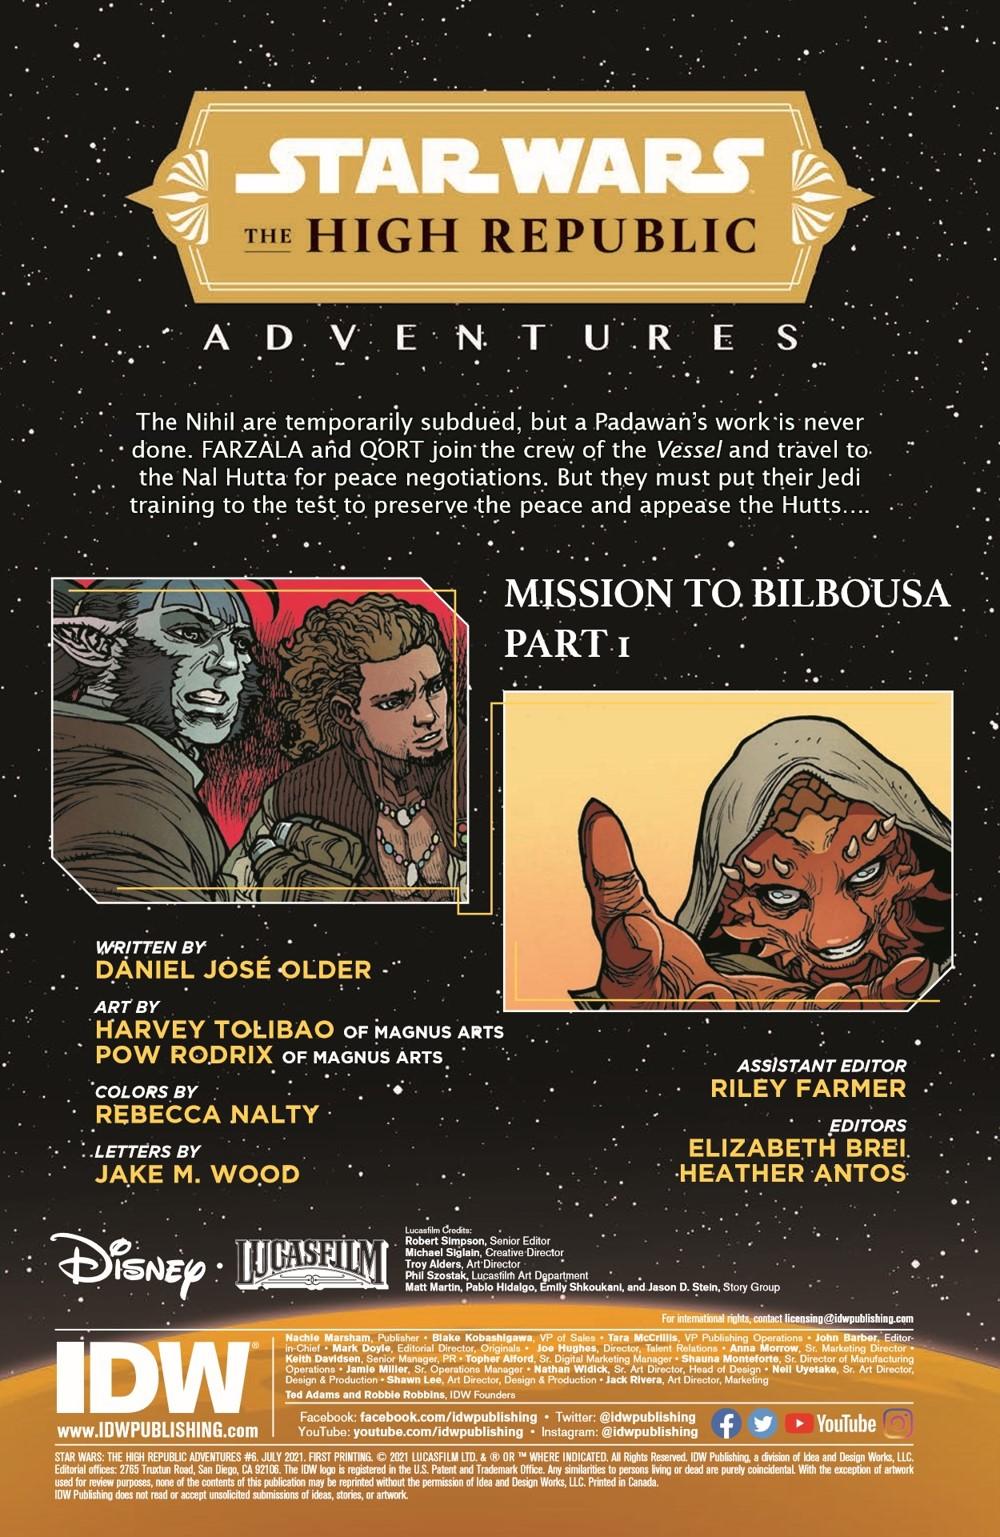 SWAHRA06-pr-2 ComicList Previews: STAR WARS THE HIGH REPUBLIC ADVENTURES #6